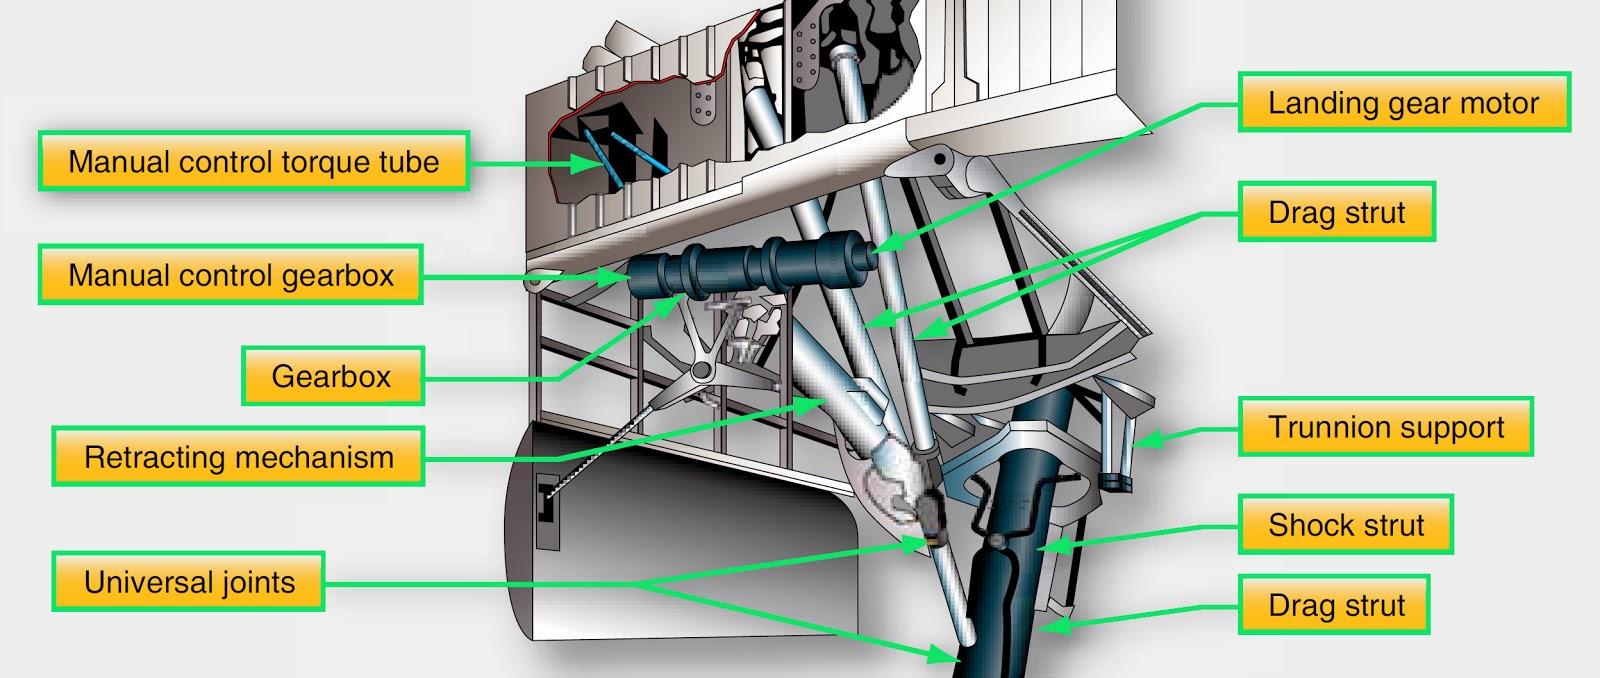 Aircraft electric motor repair famous aircraft 2017 for Small electric motor repair